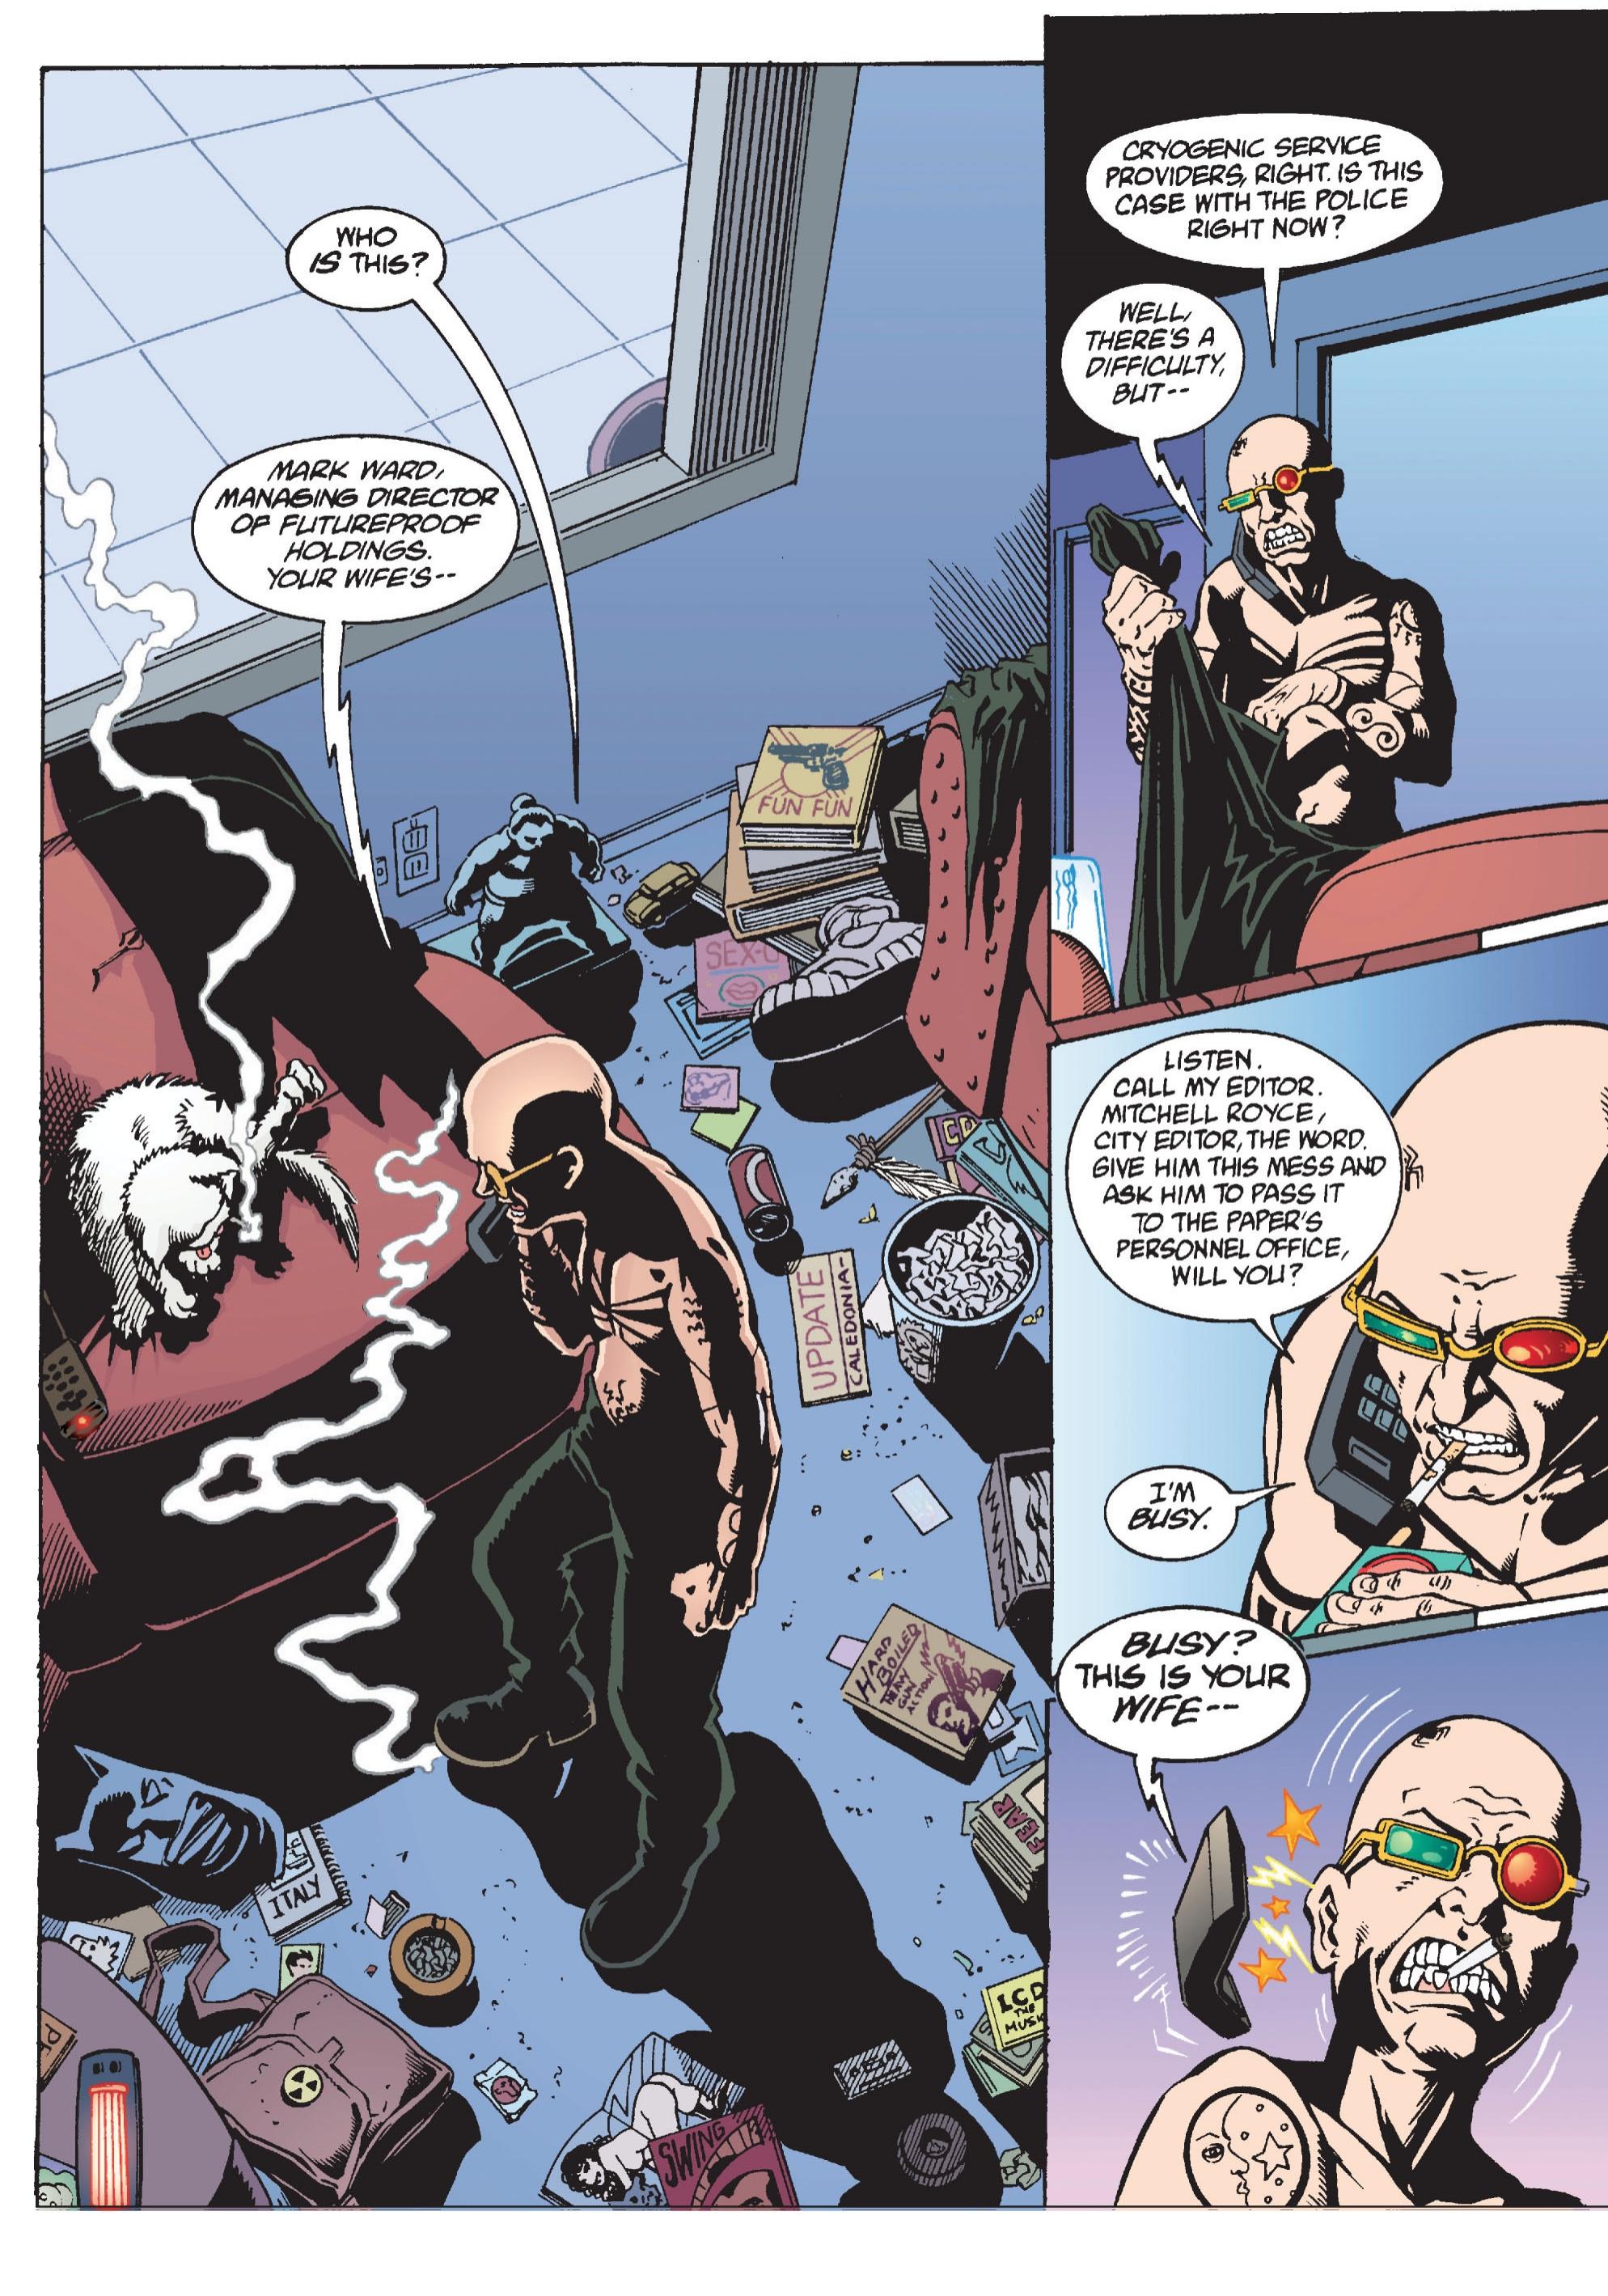 Transmetropolitan (1997) #10 pg.03, lettered by Clem Robins.